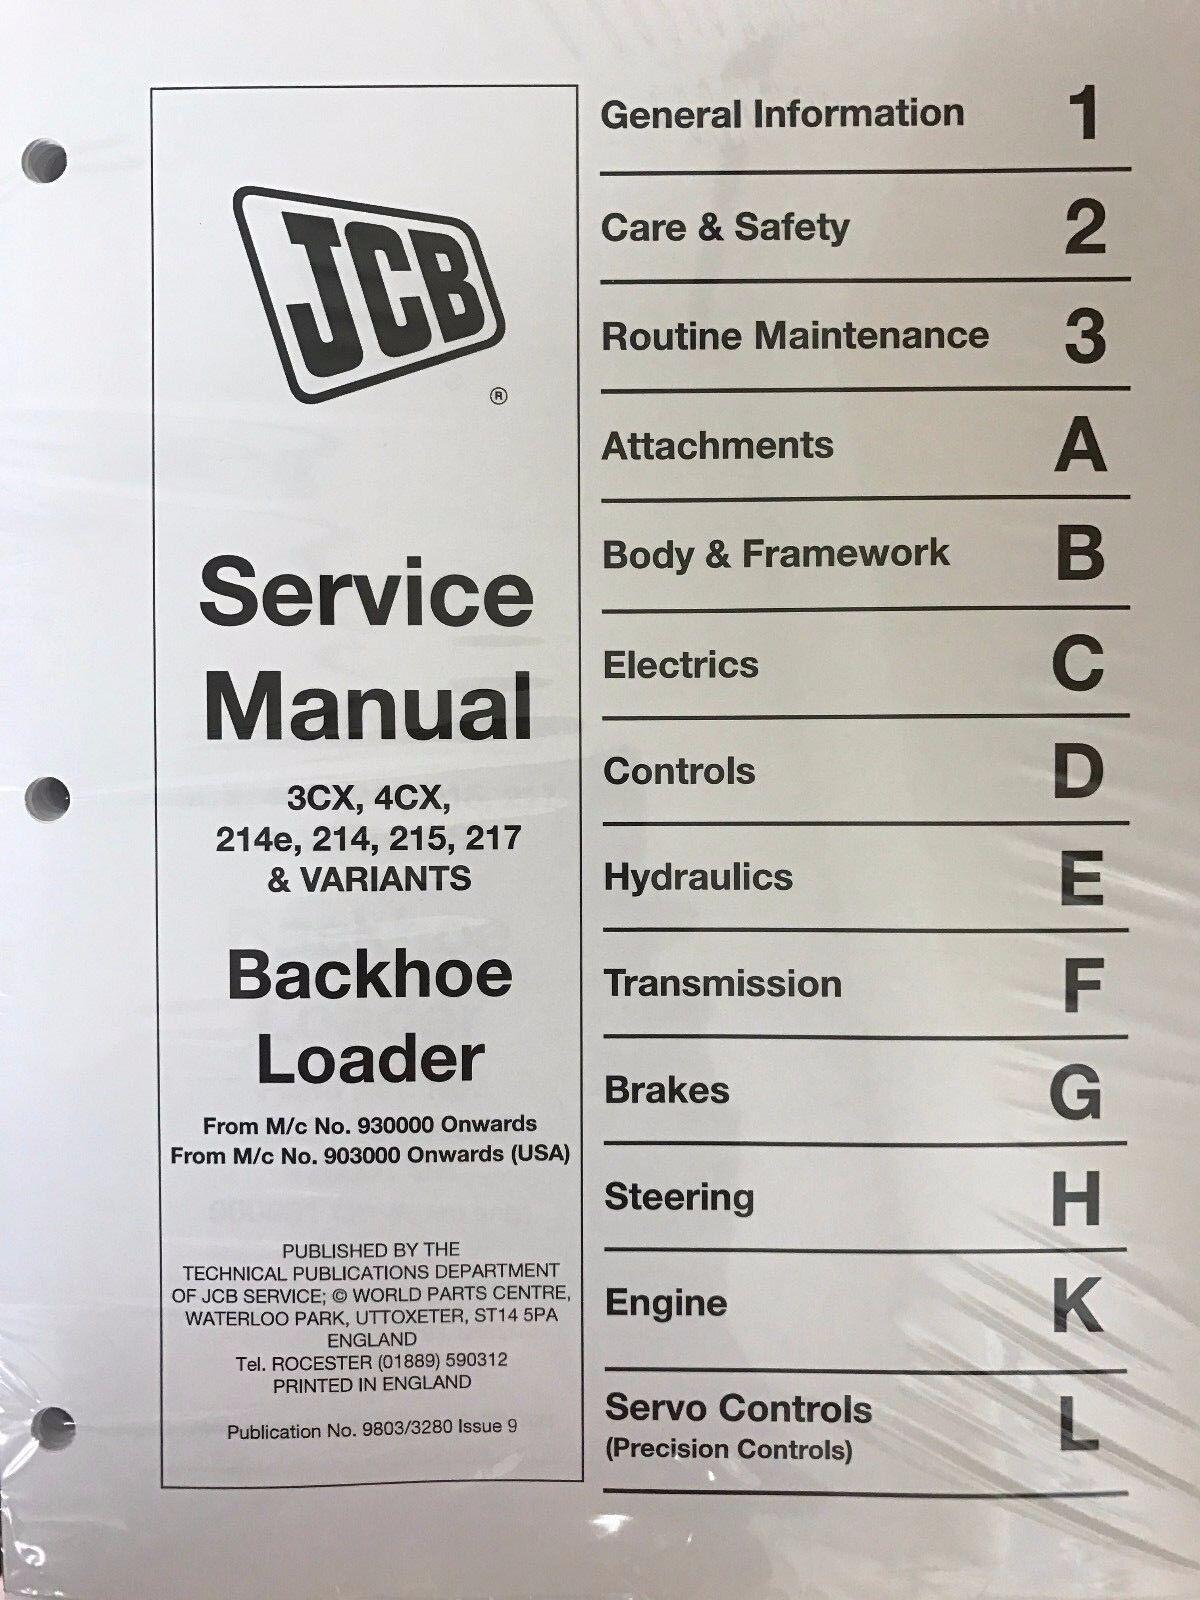 Jcb Backhoe Wiring Diagram 1994 Trusted Diagrams 214 Loader Services U2022 Manual